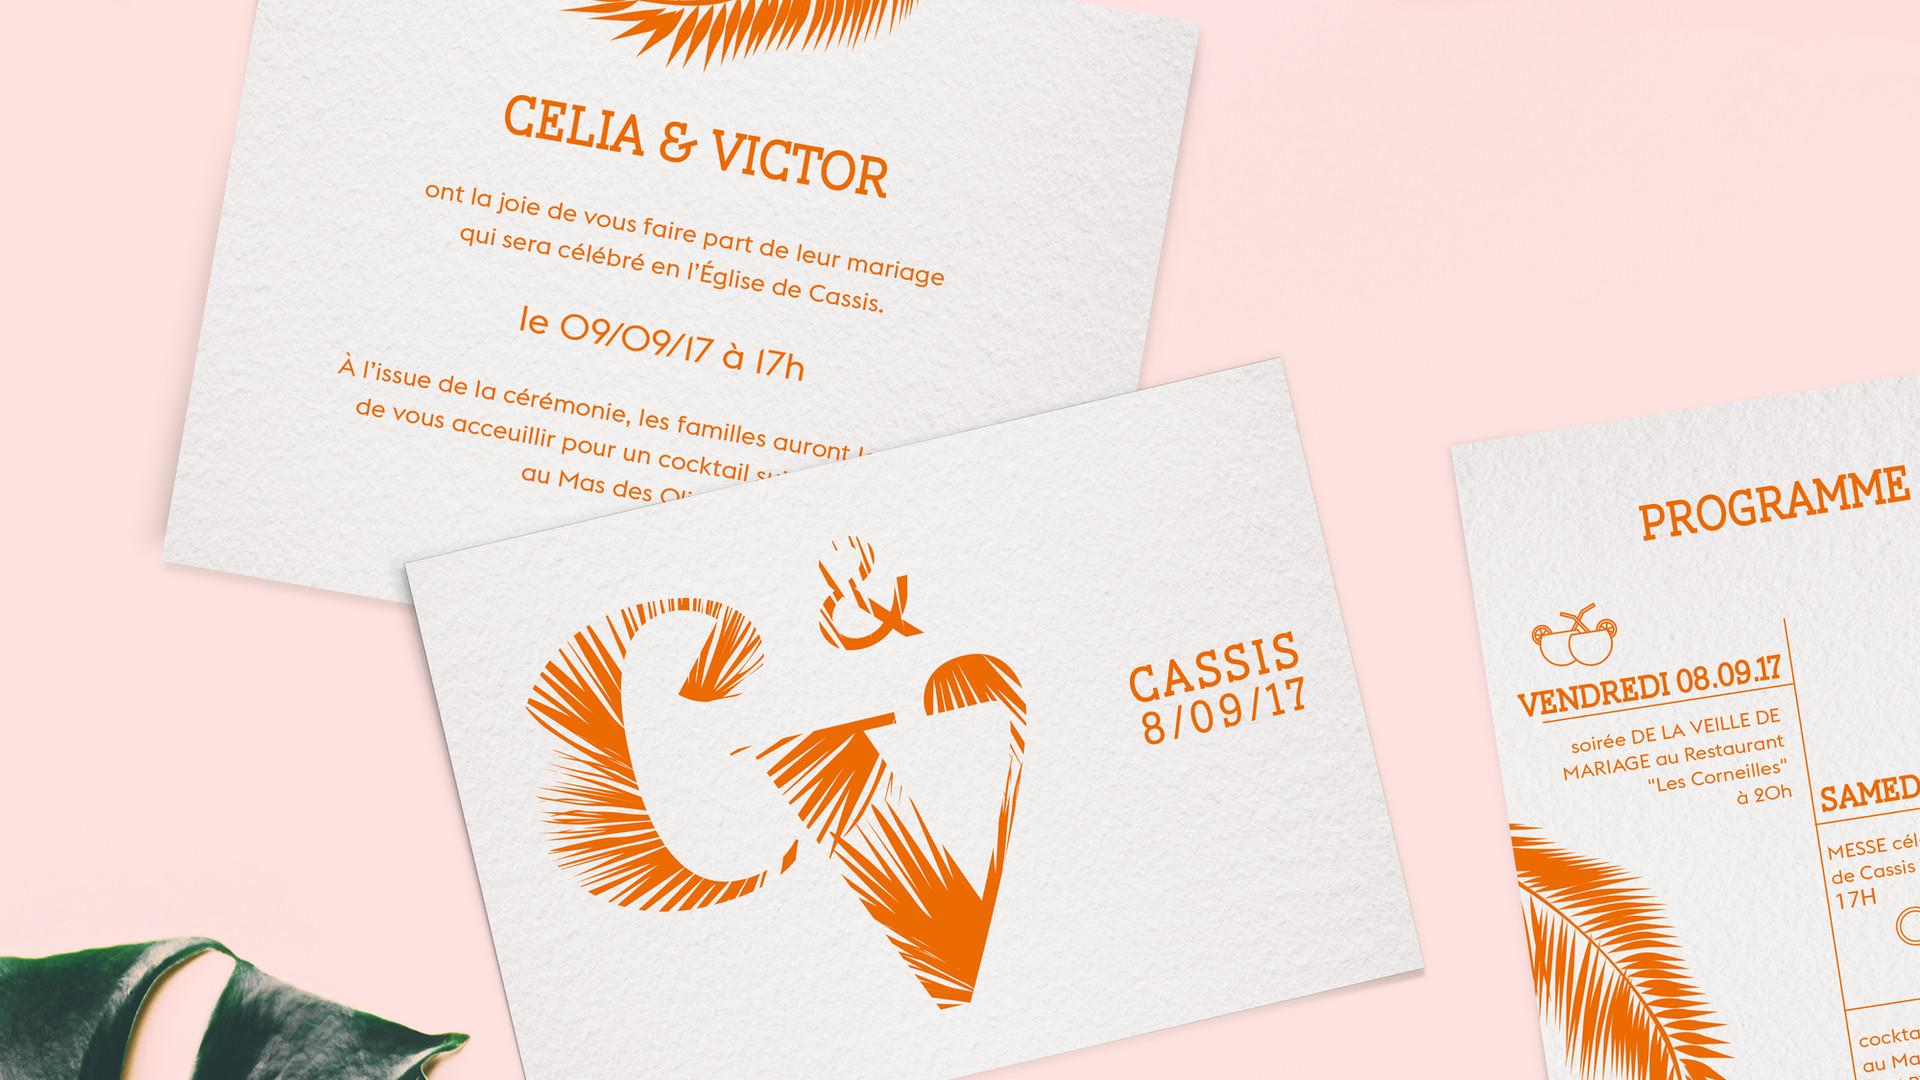 Célia & Victor